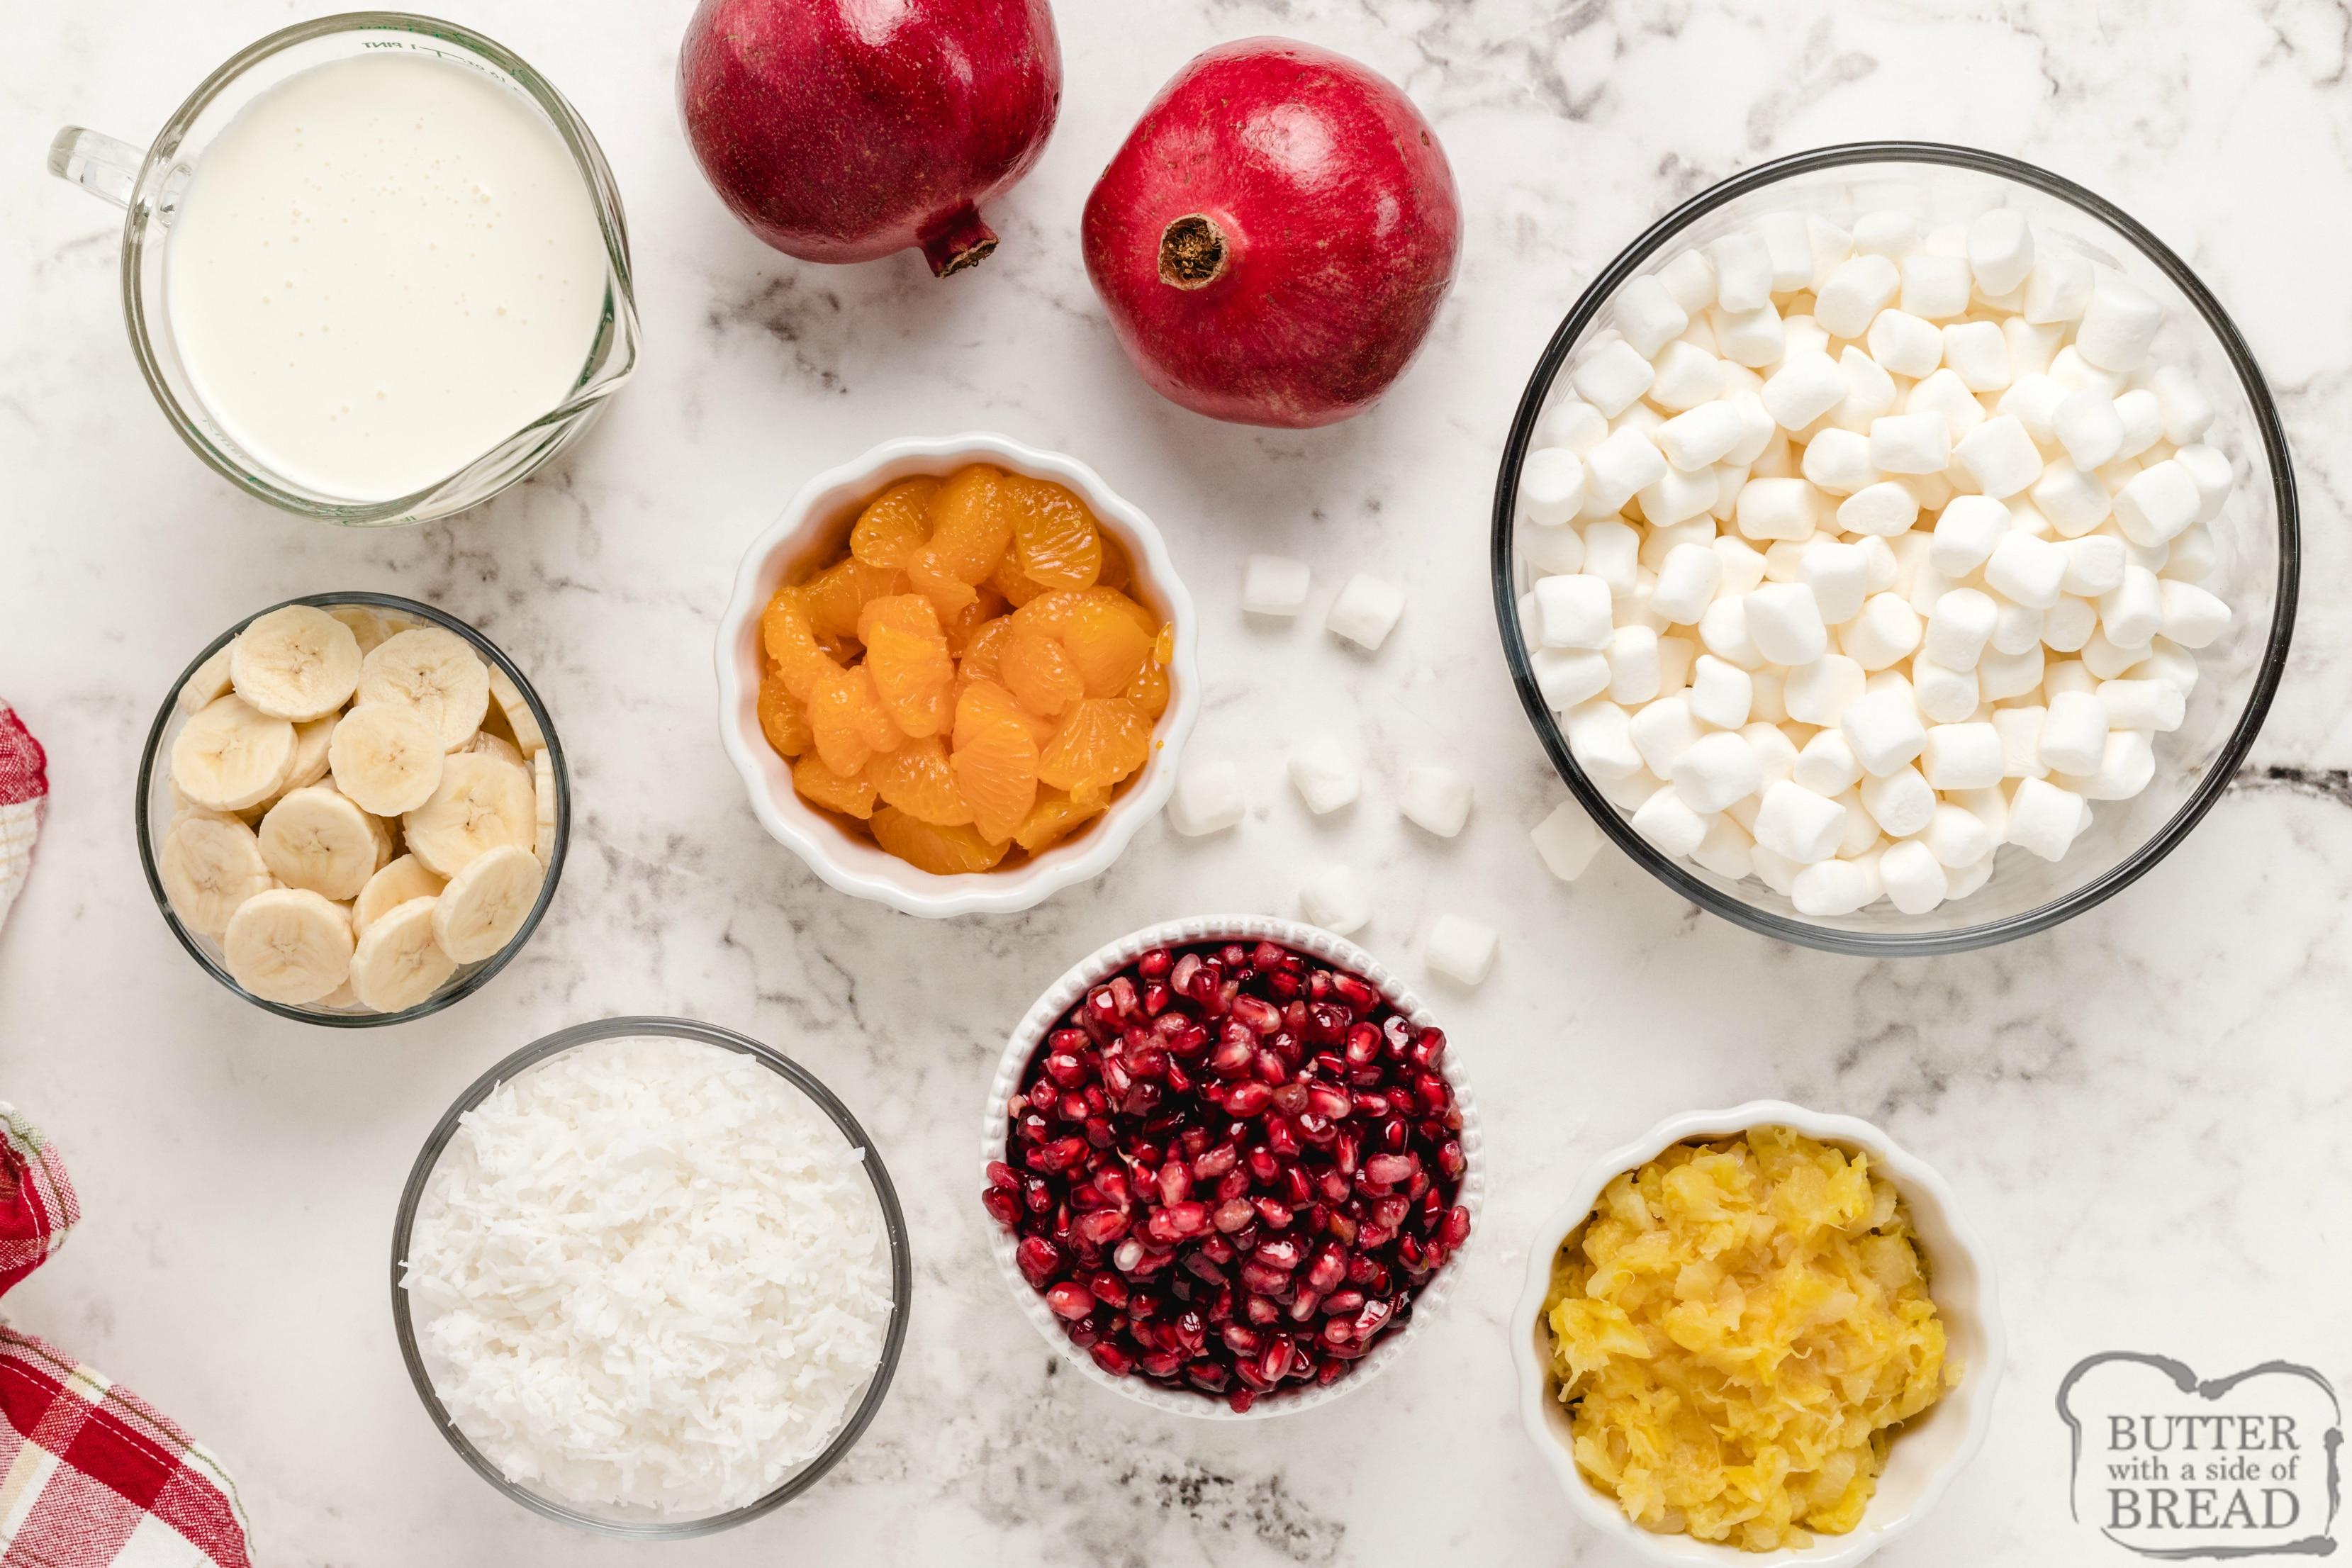 Ingredients in fruit salad recipe